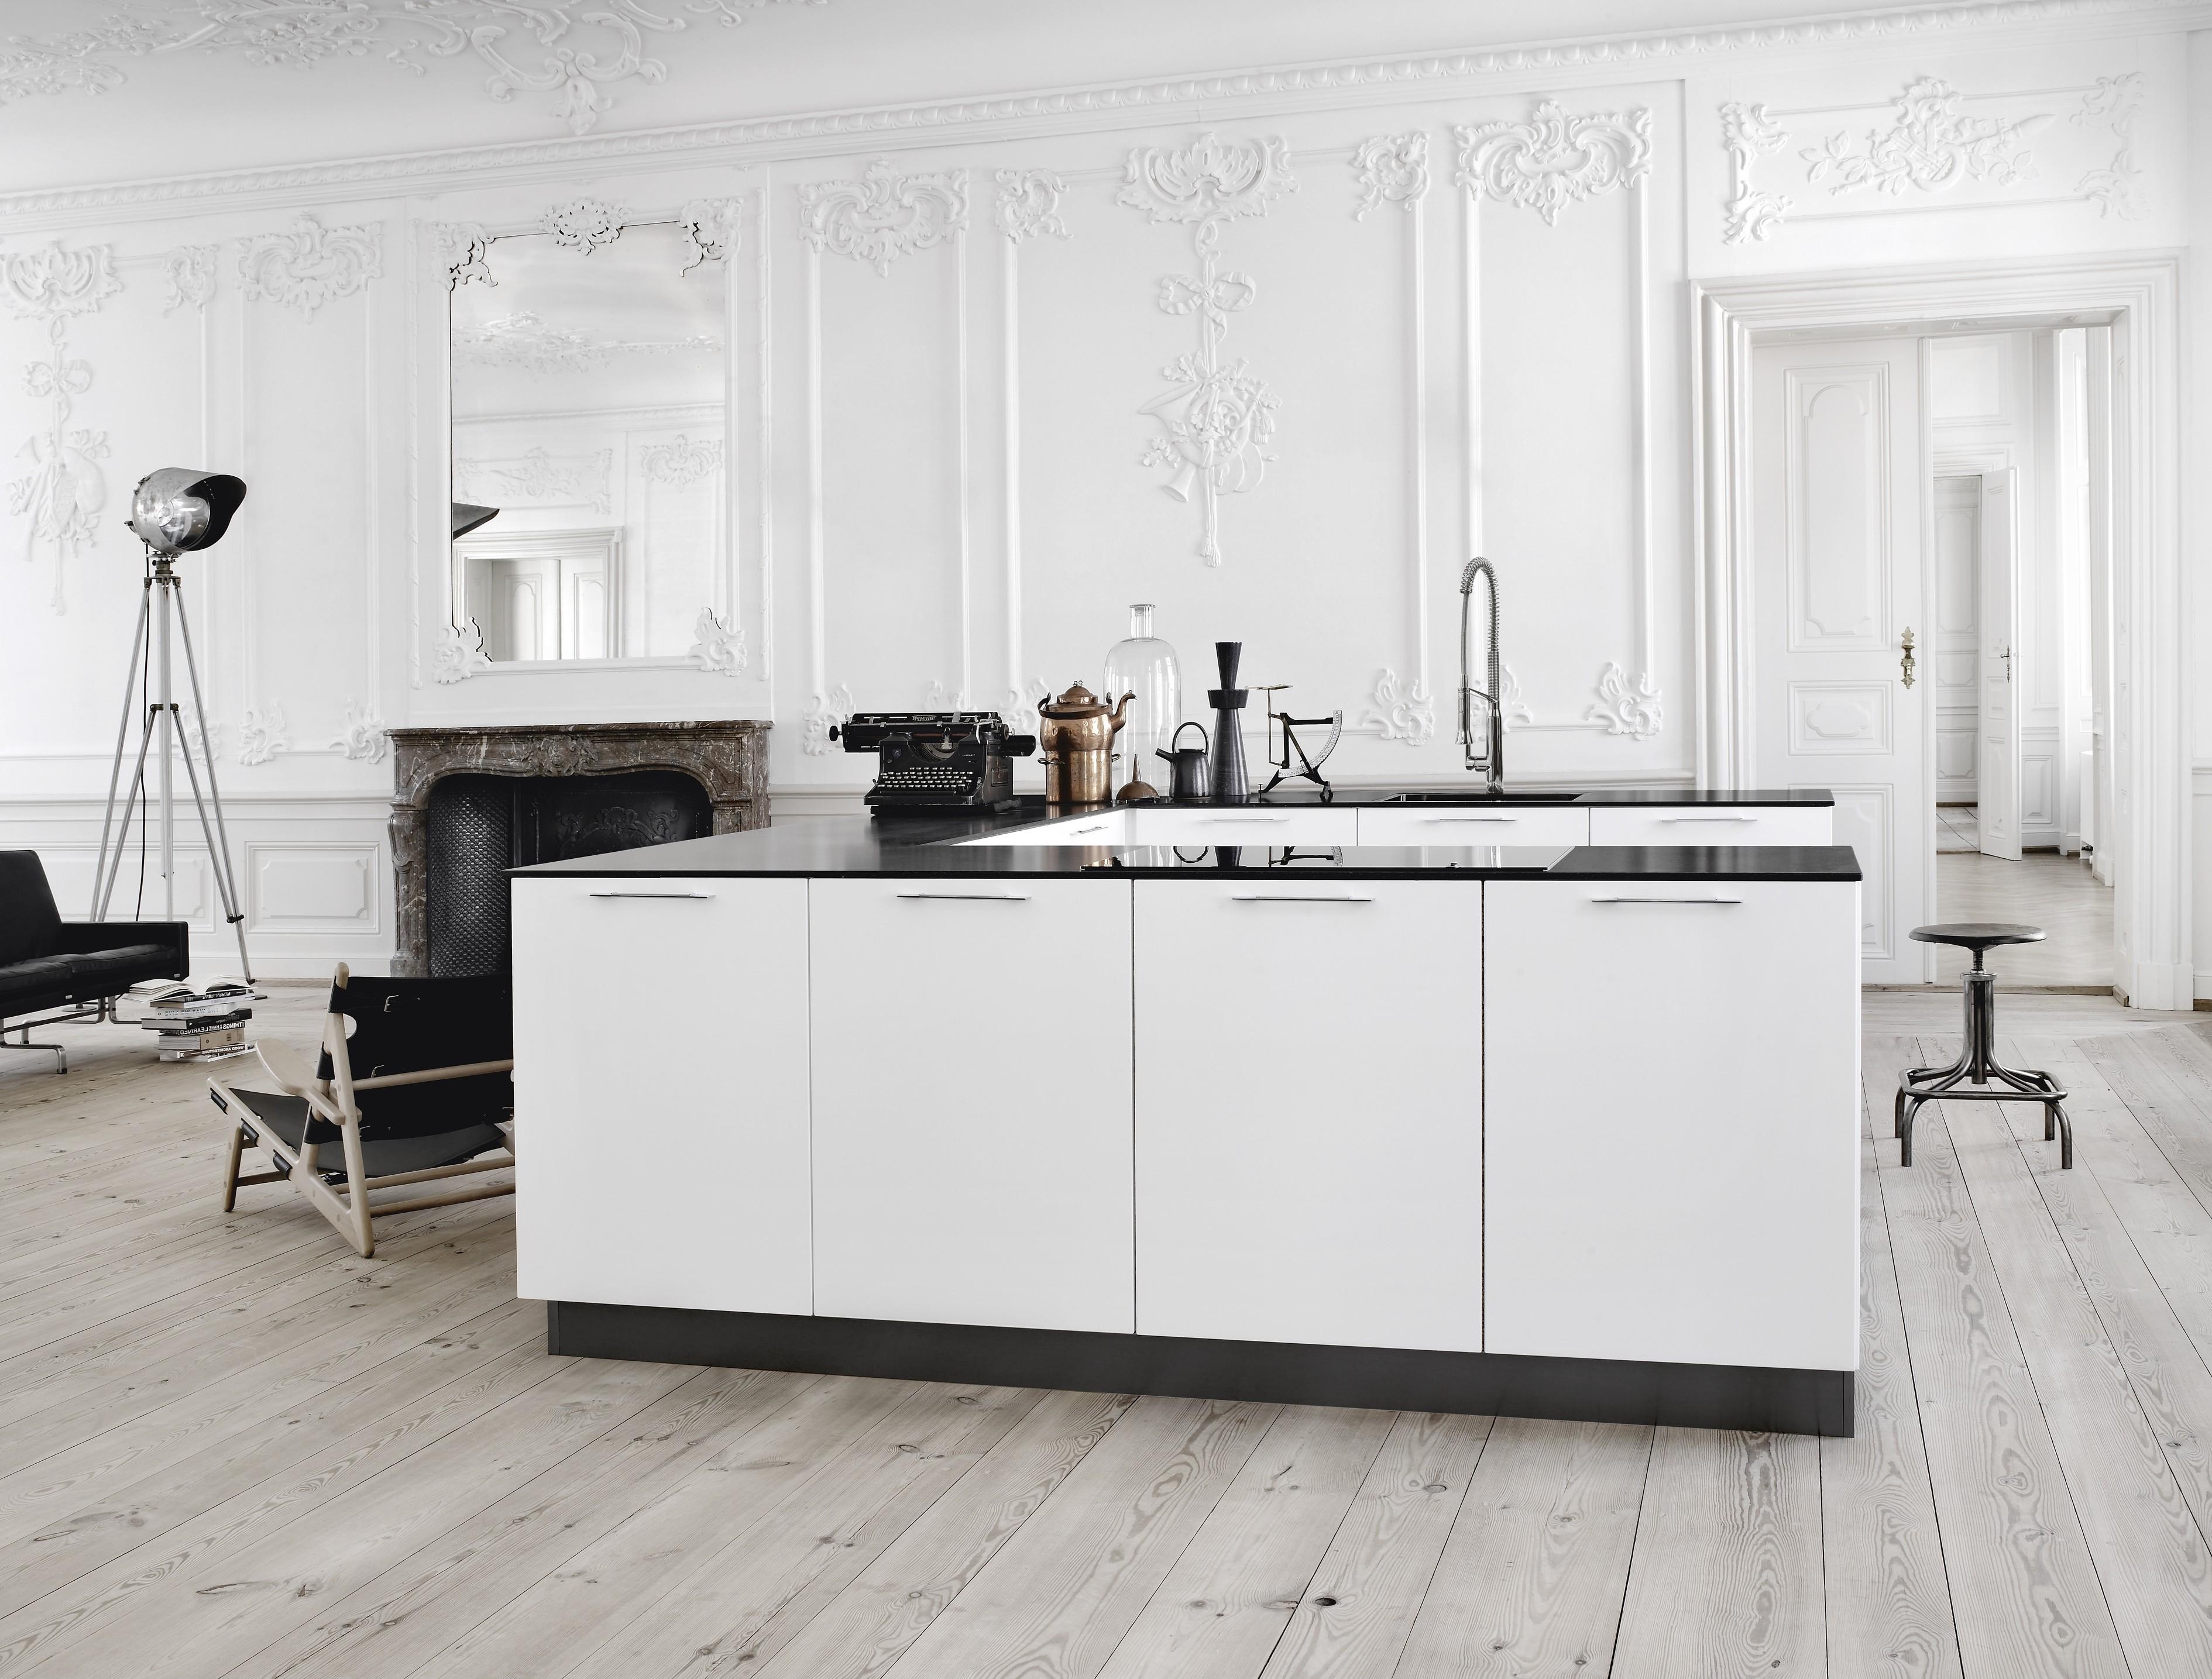 Poignées Meubles Cuisine Ikea